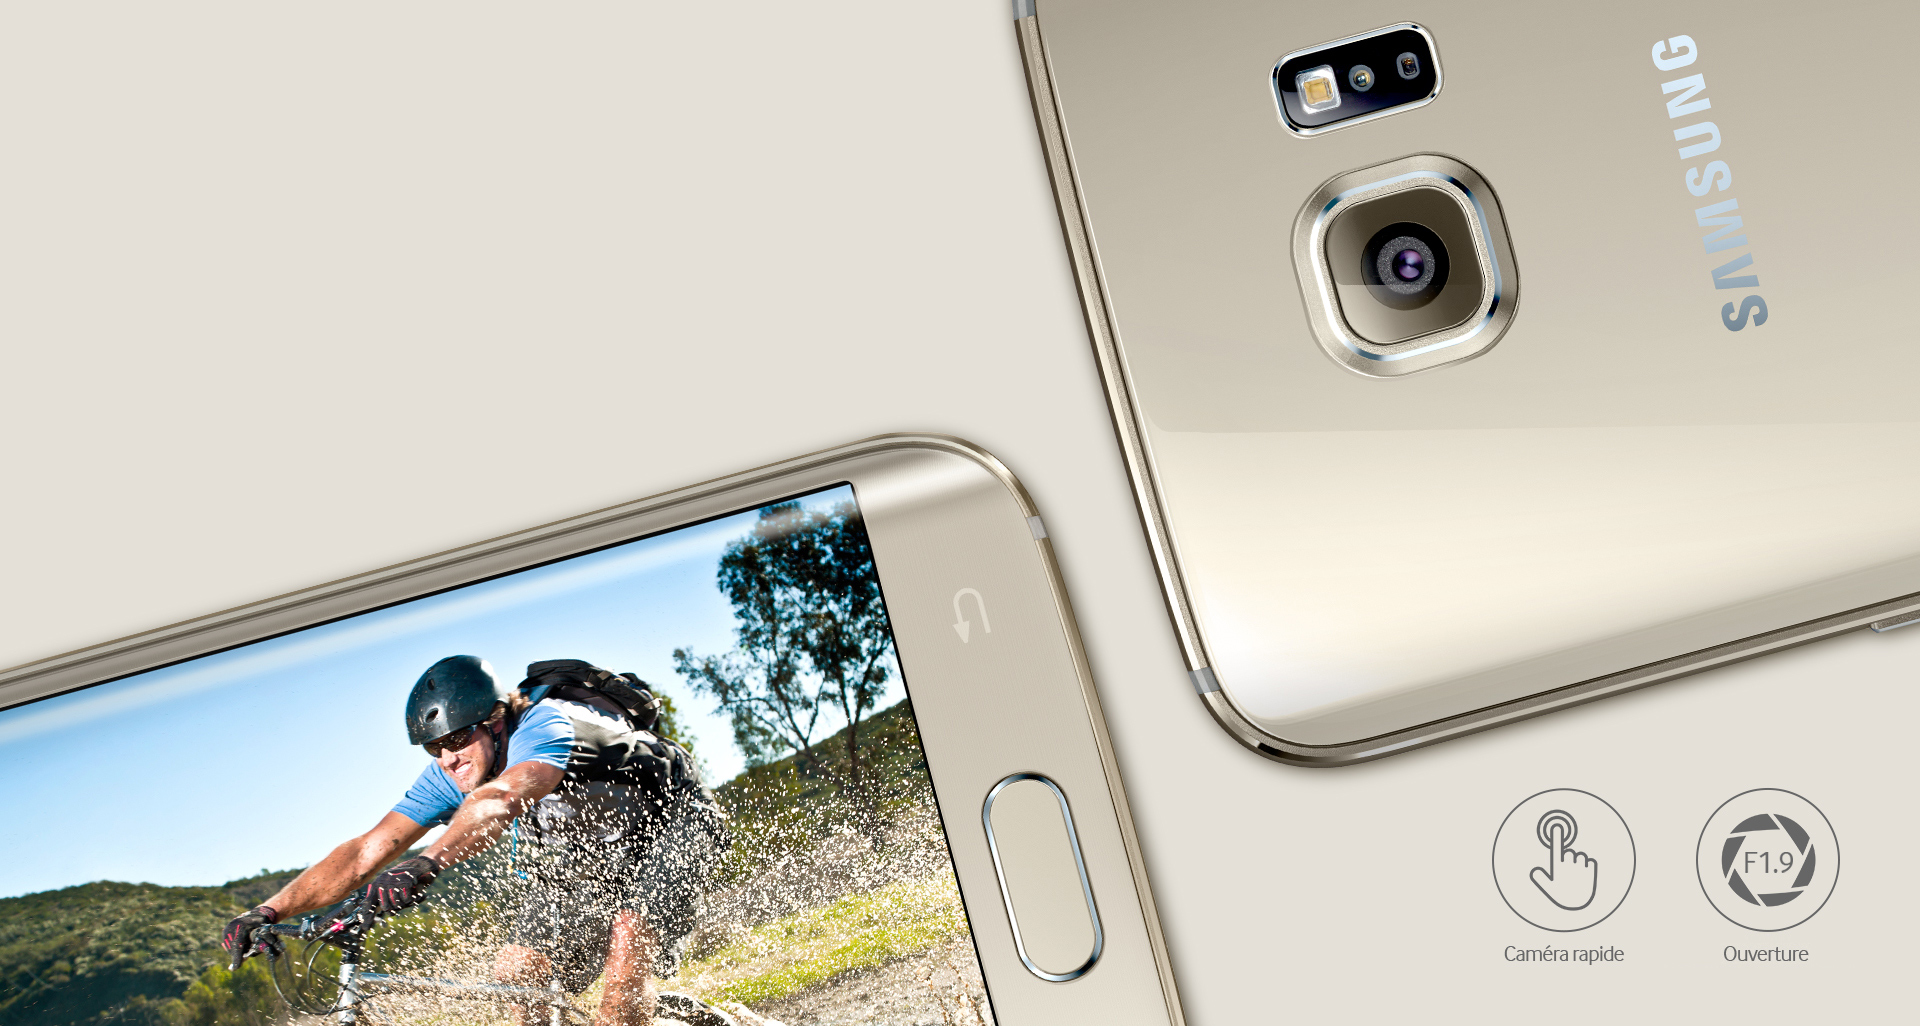 Camera Galaxy S6 Edge